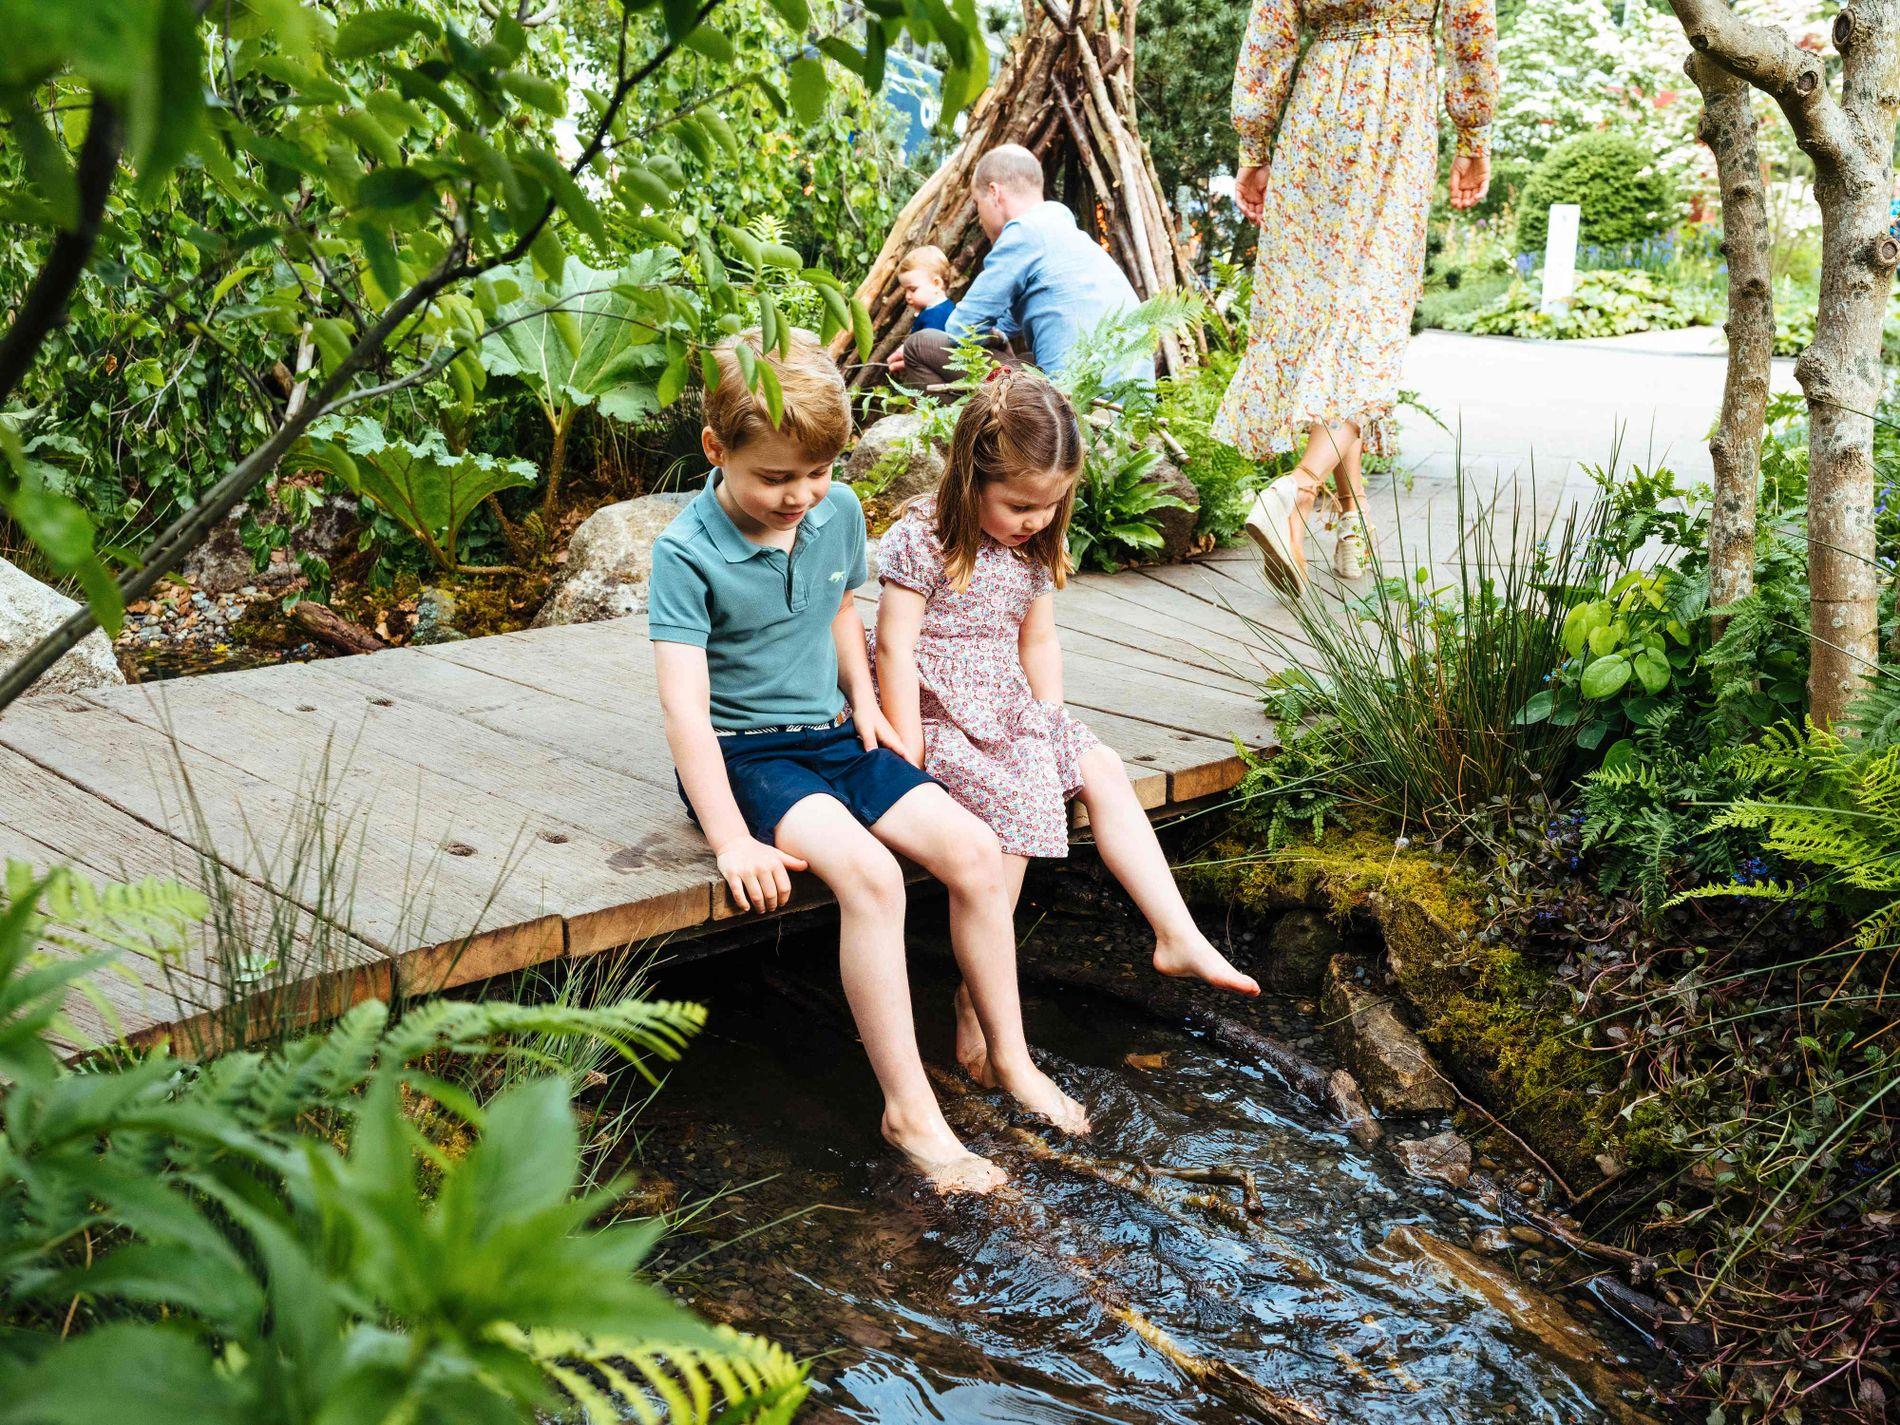 KOSER SEG: Prins George og prinsesse Charlotte storkoste seg i sin «egen» hage.